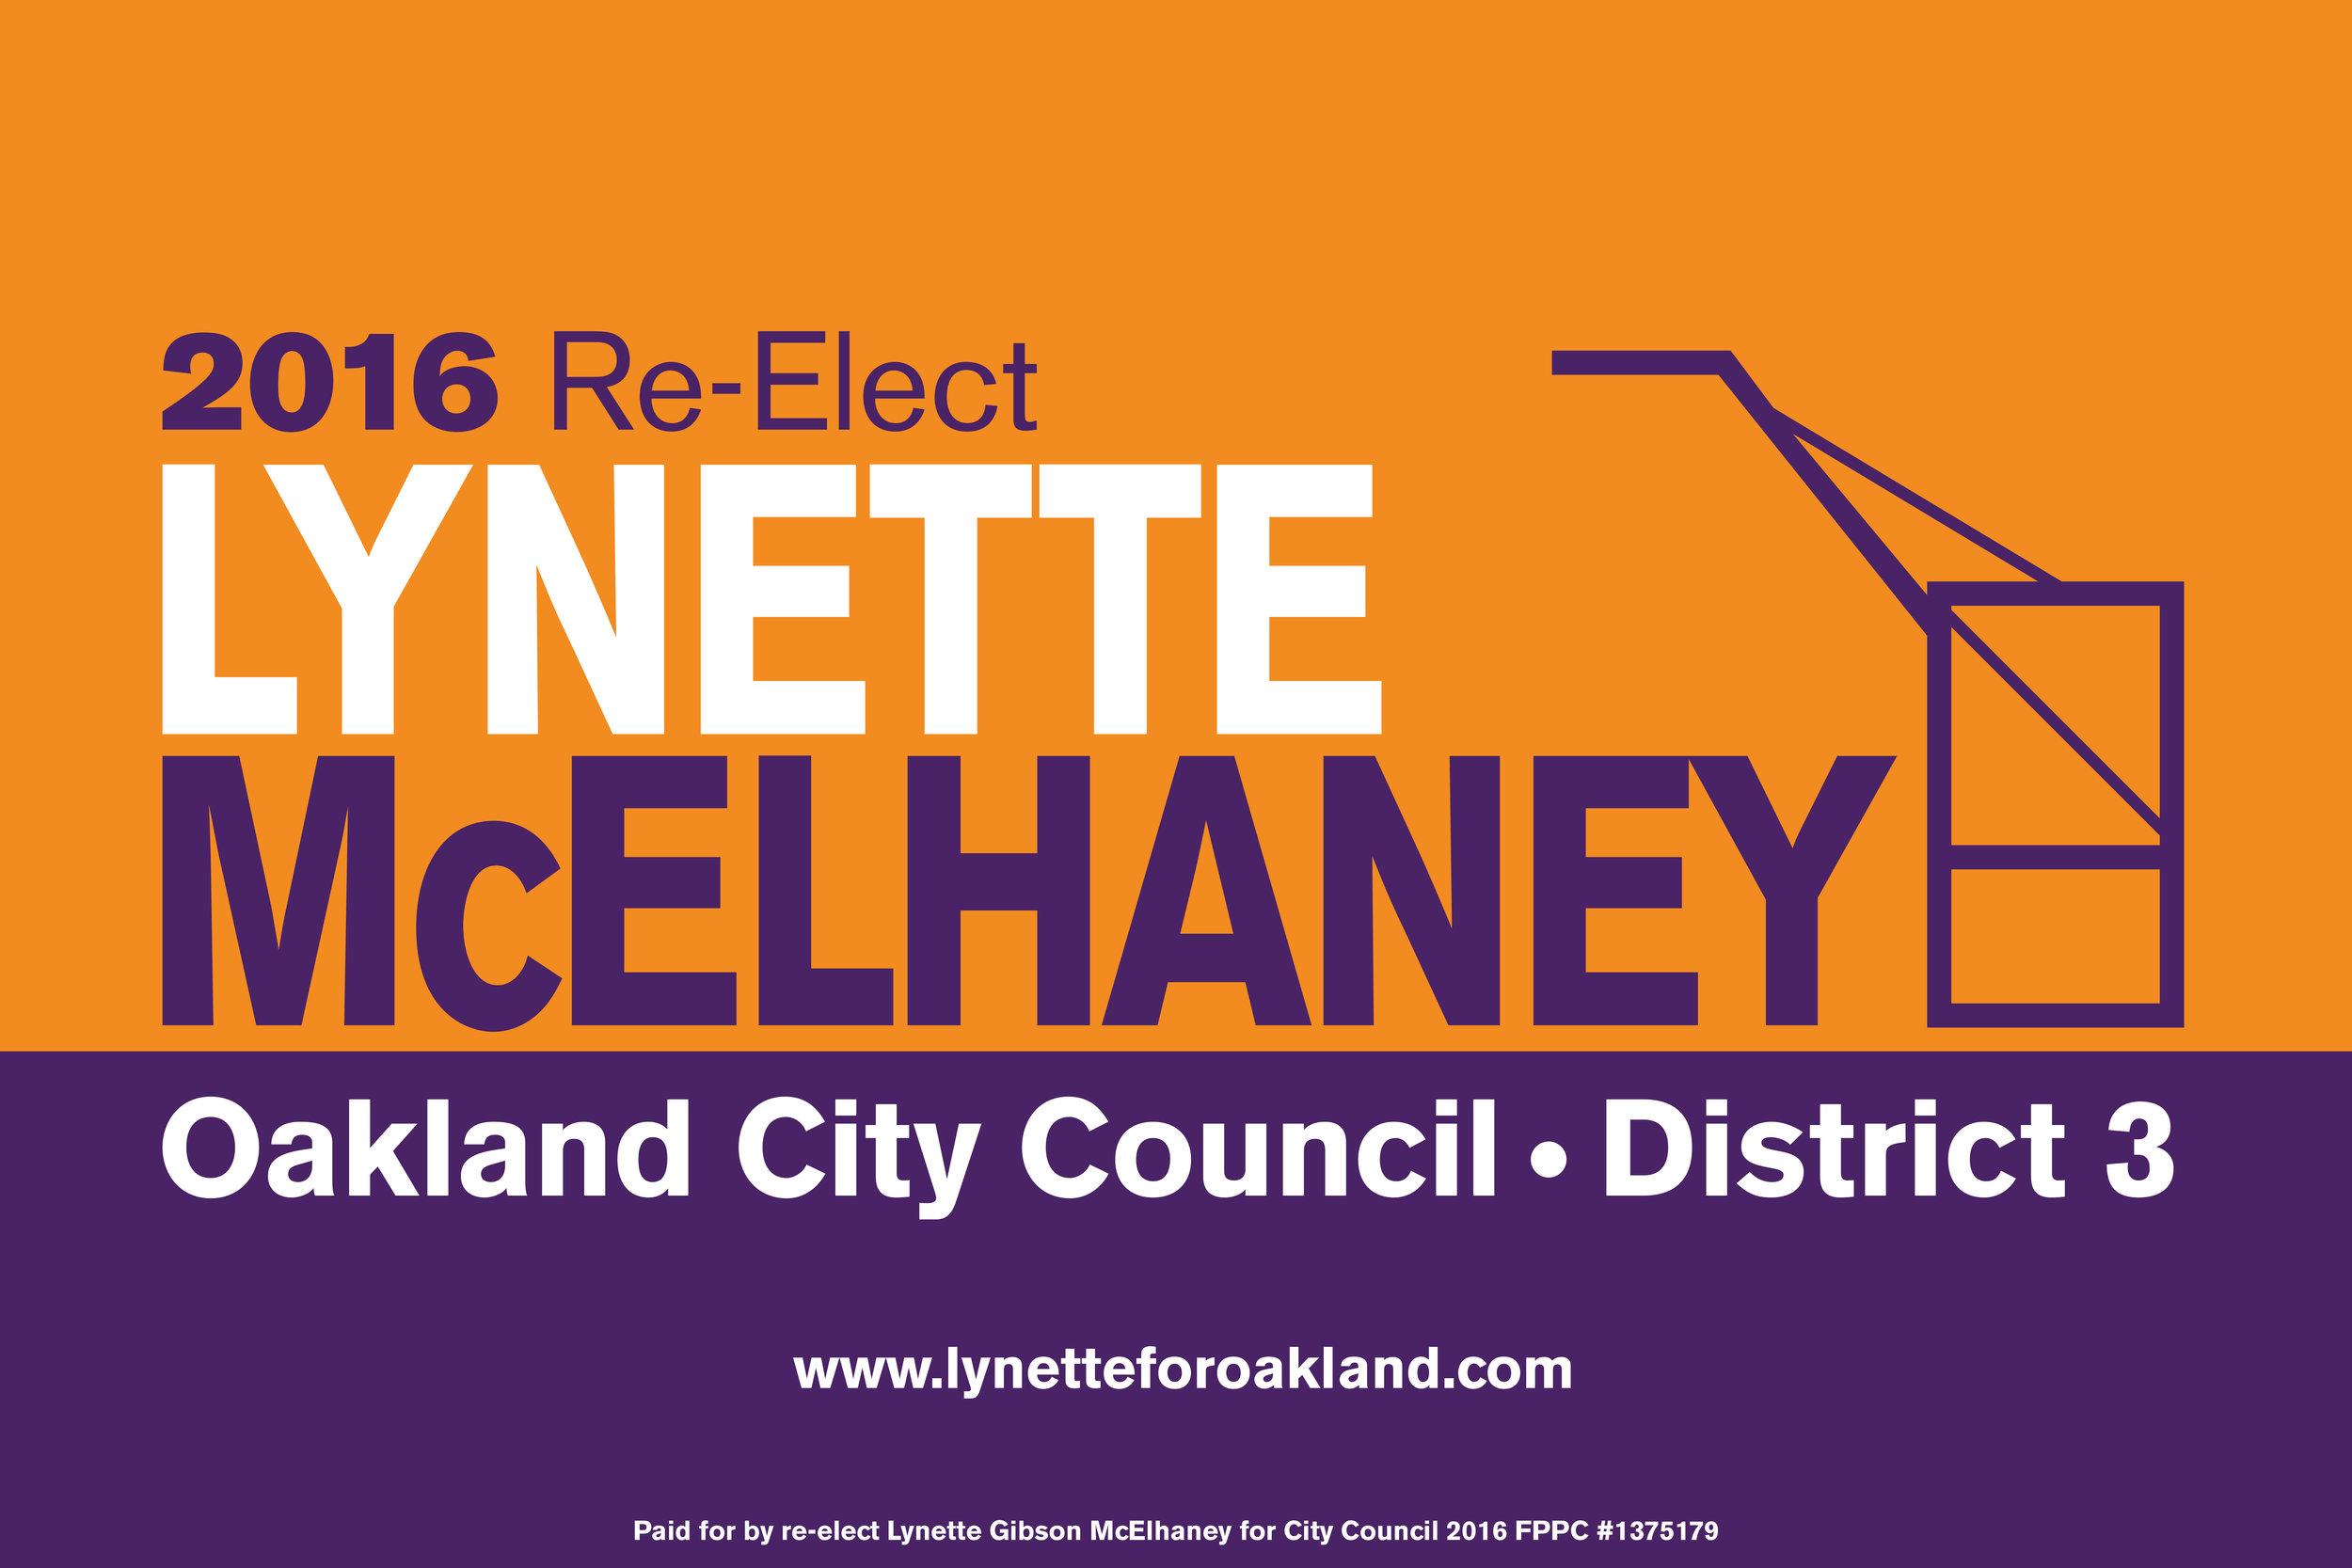 Lynette McElhaney